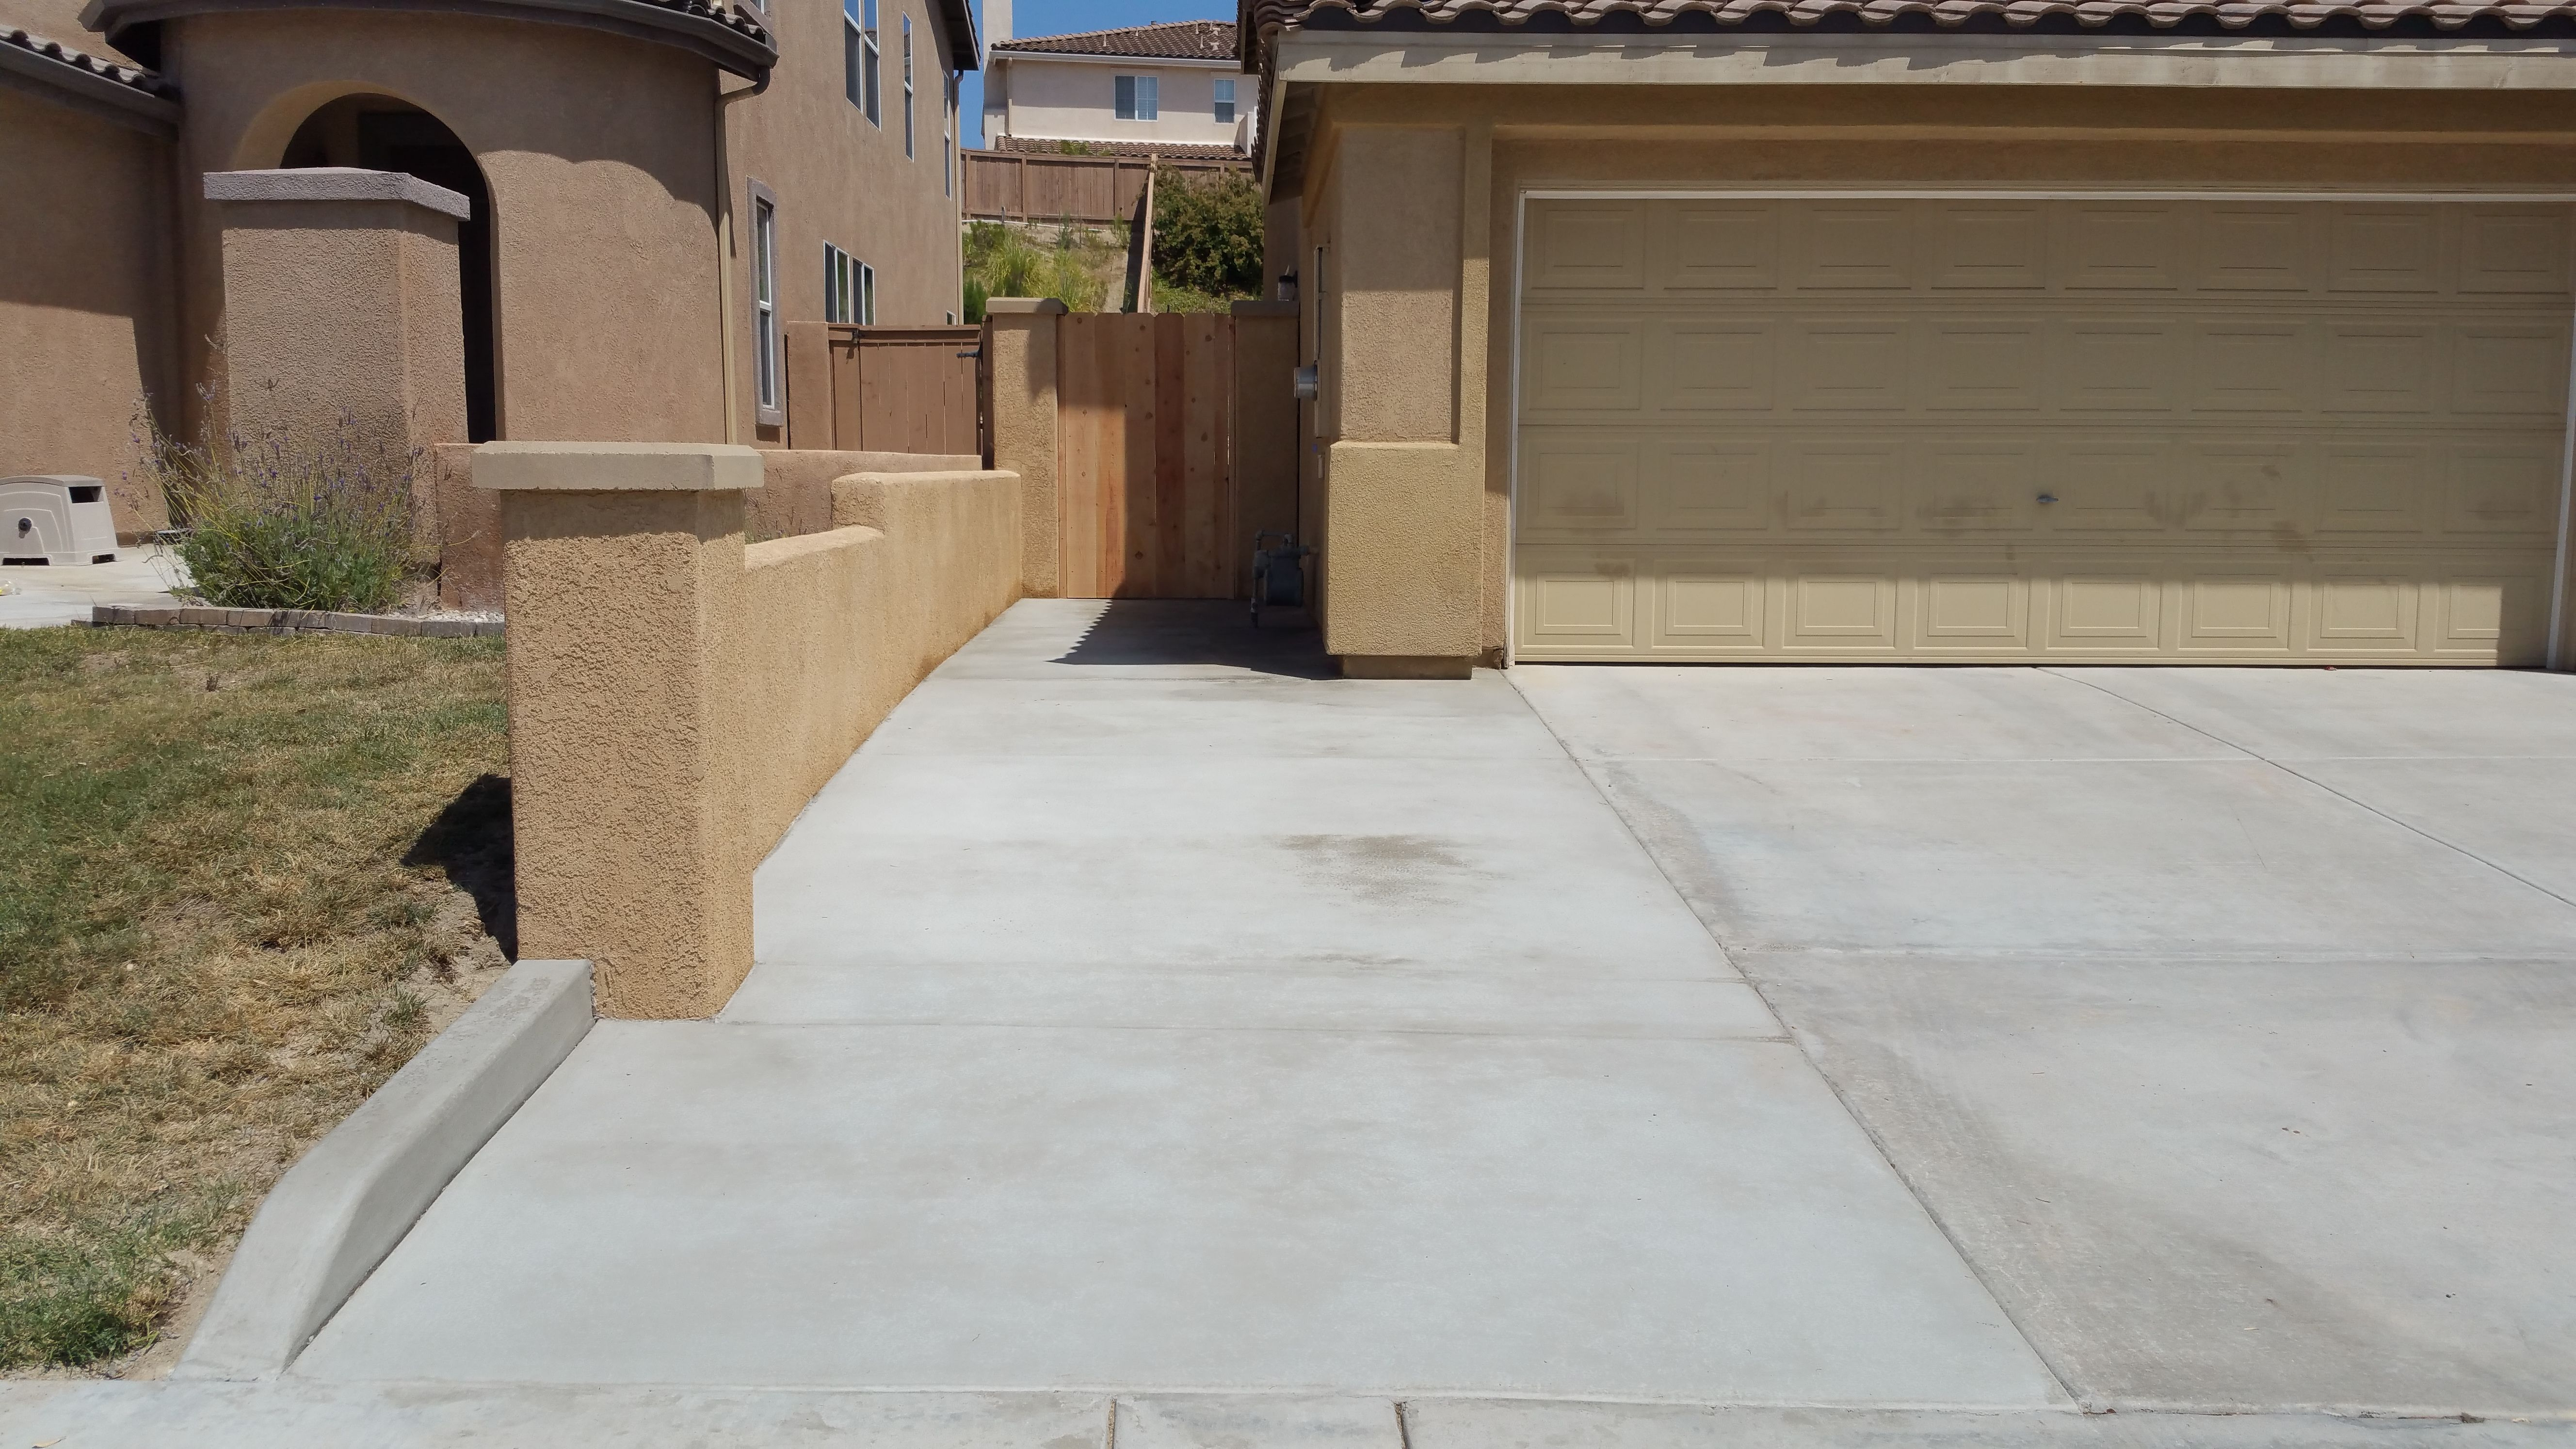 Retaining Wall Concrete Driveway Agundez Concrete